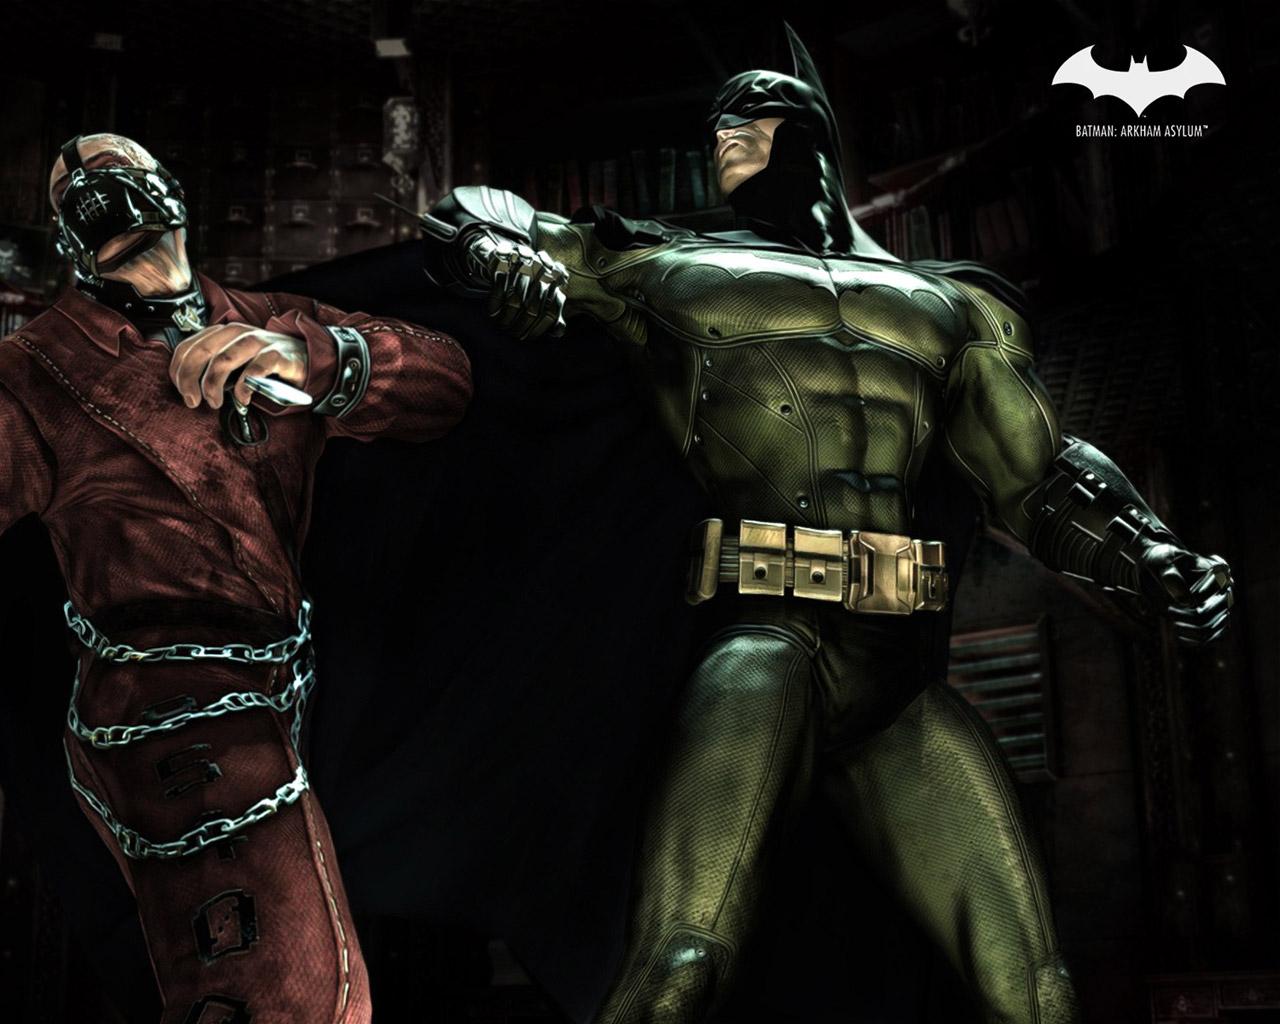 Batman: Arkham Asylum Wallpaper in 1280x1024